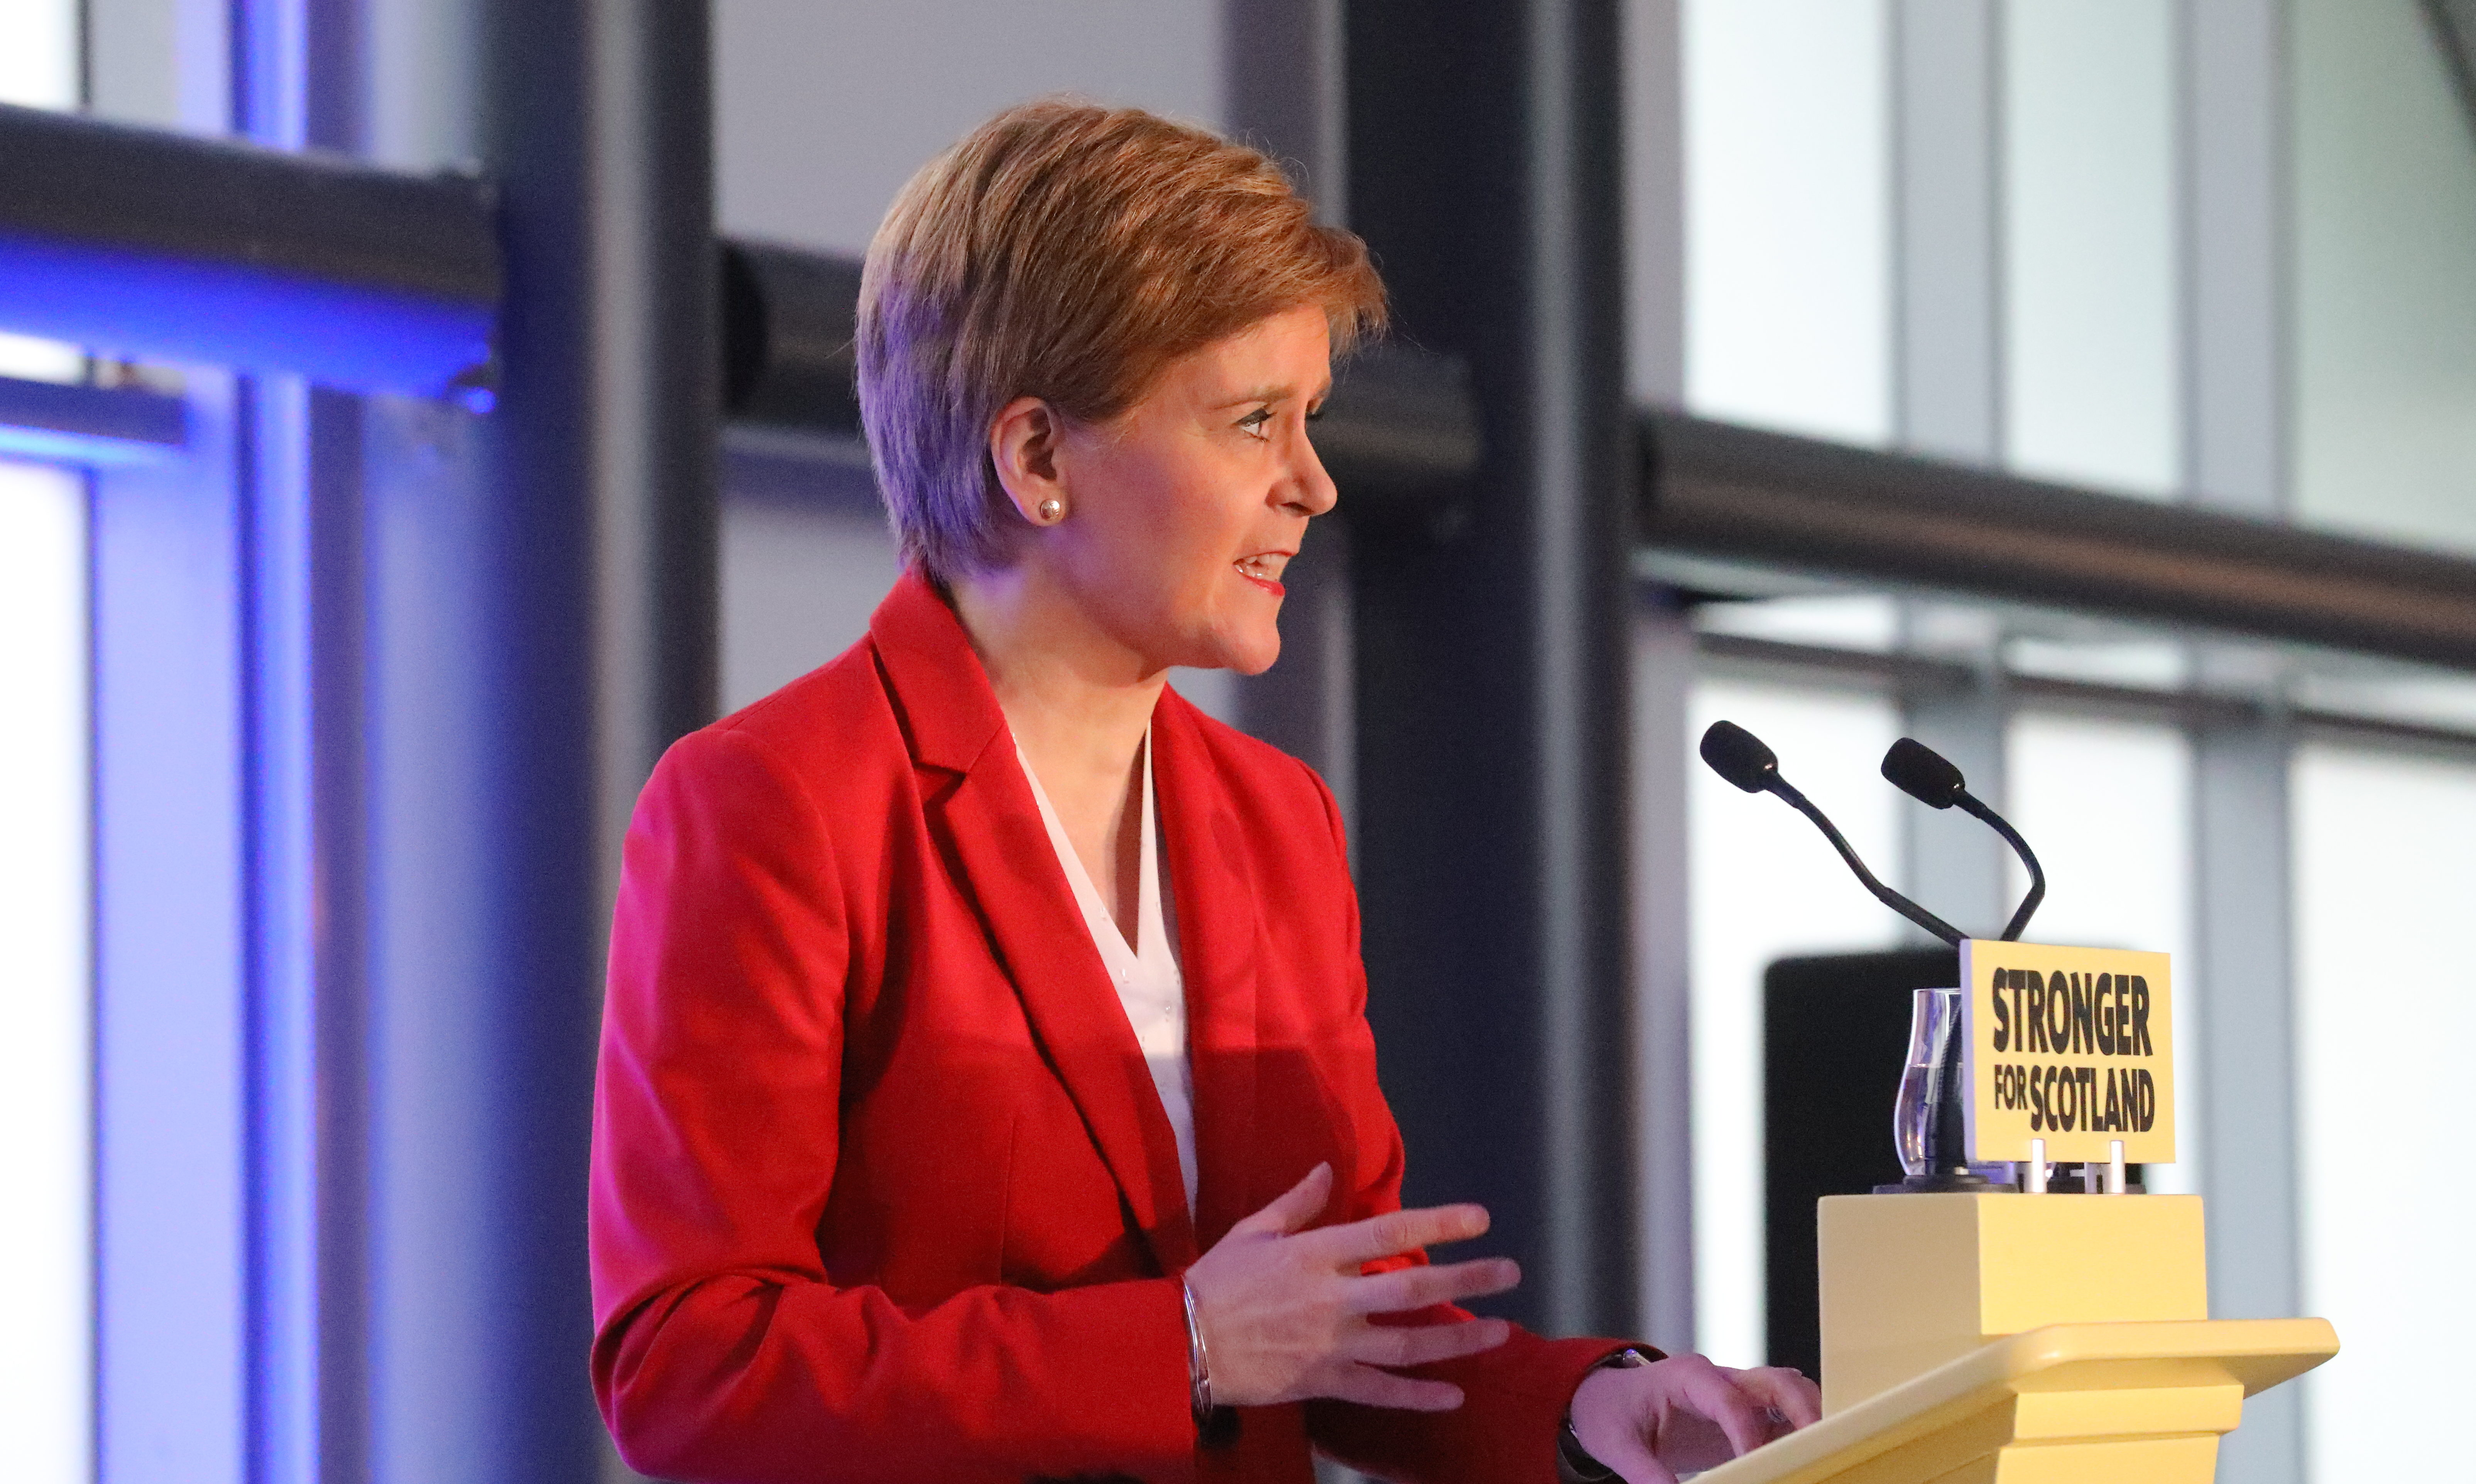 Nicola Sturgeon giving her speech in Dundee on Wednesday.